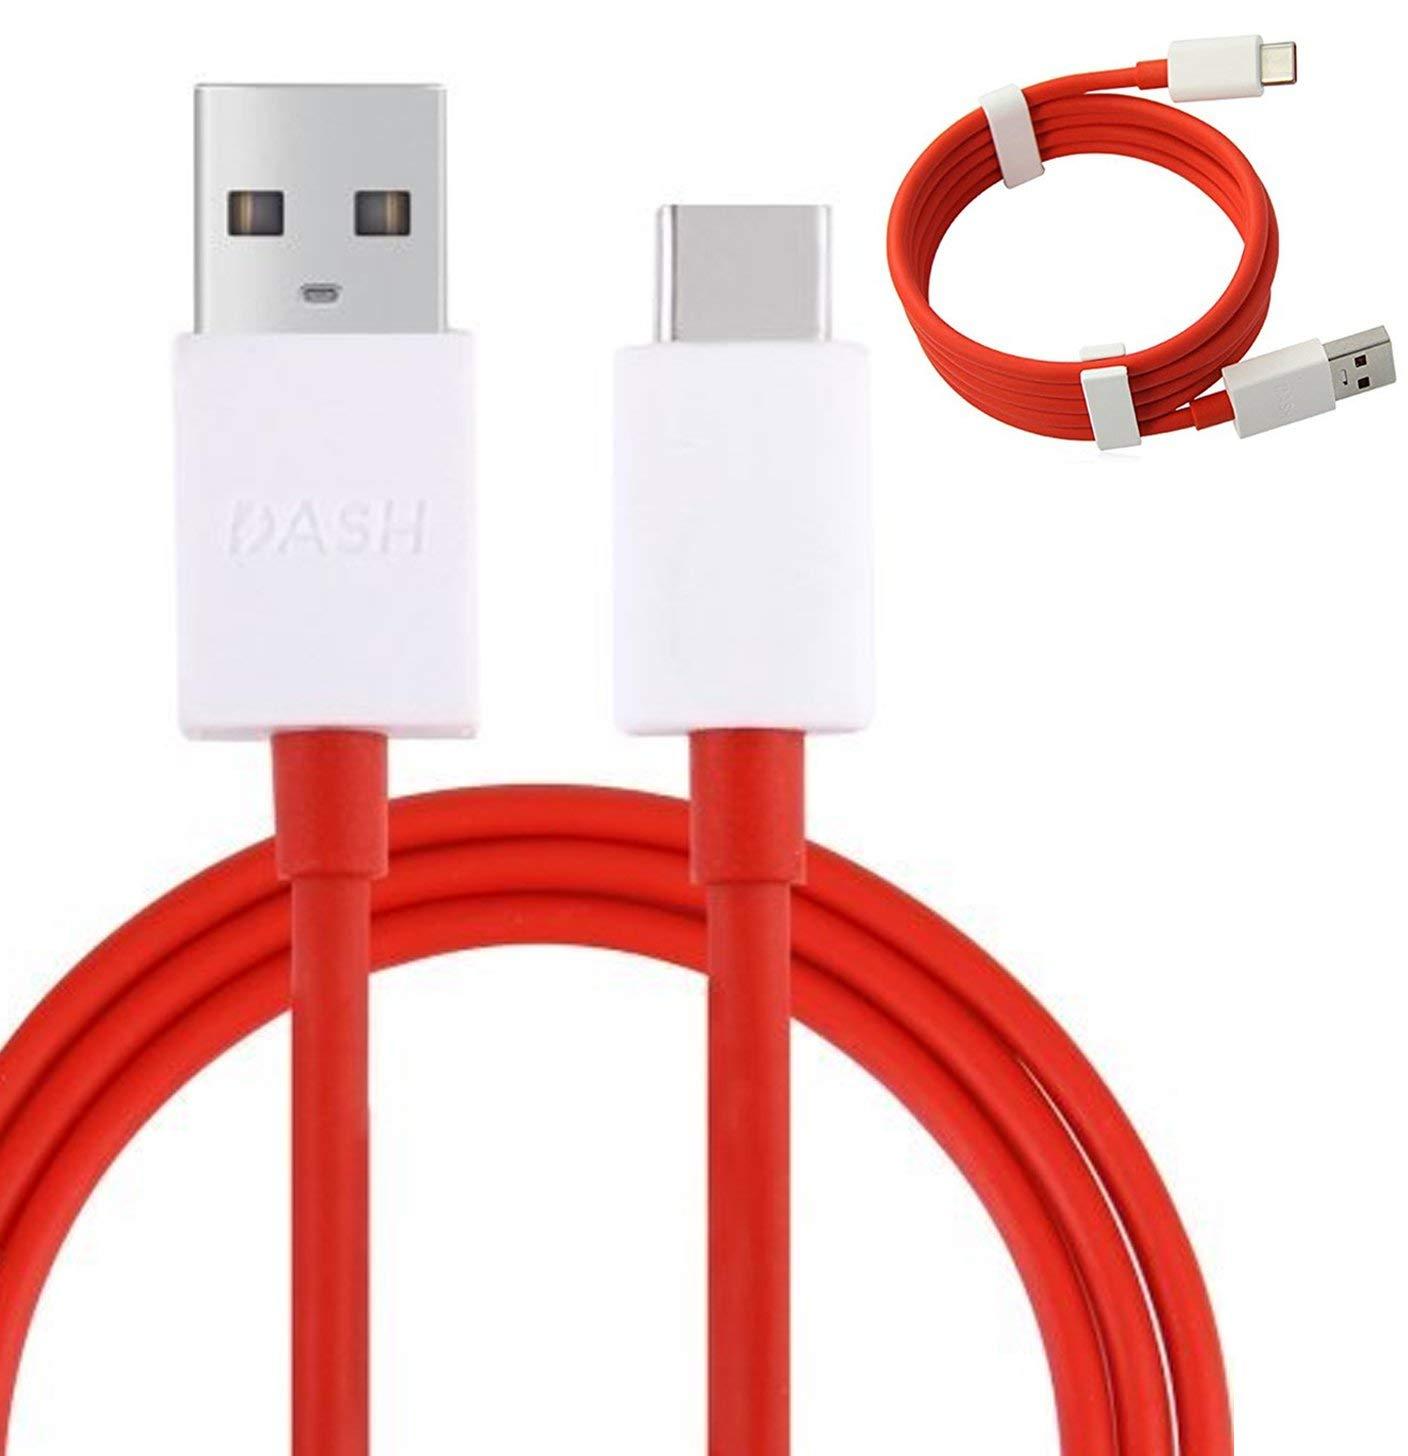 OnePlus Dash Type C 1M Fast USB Data